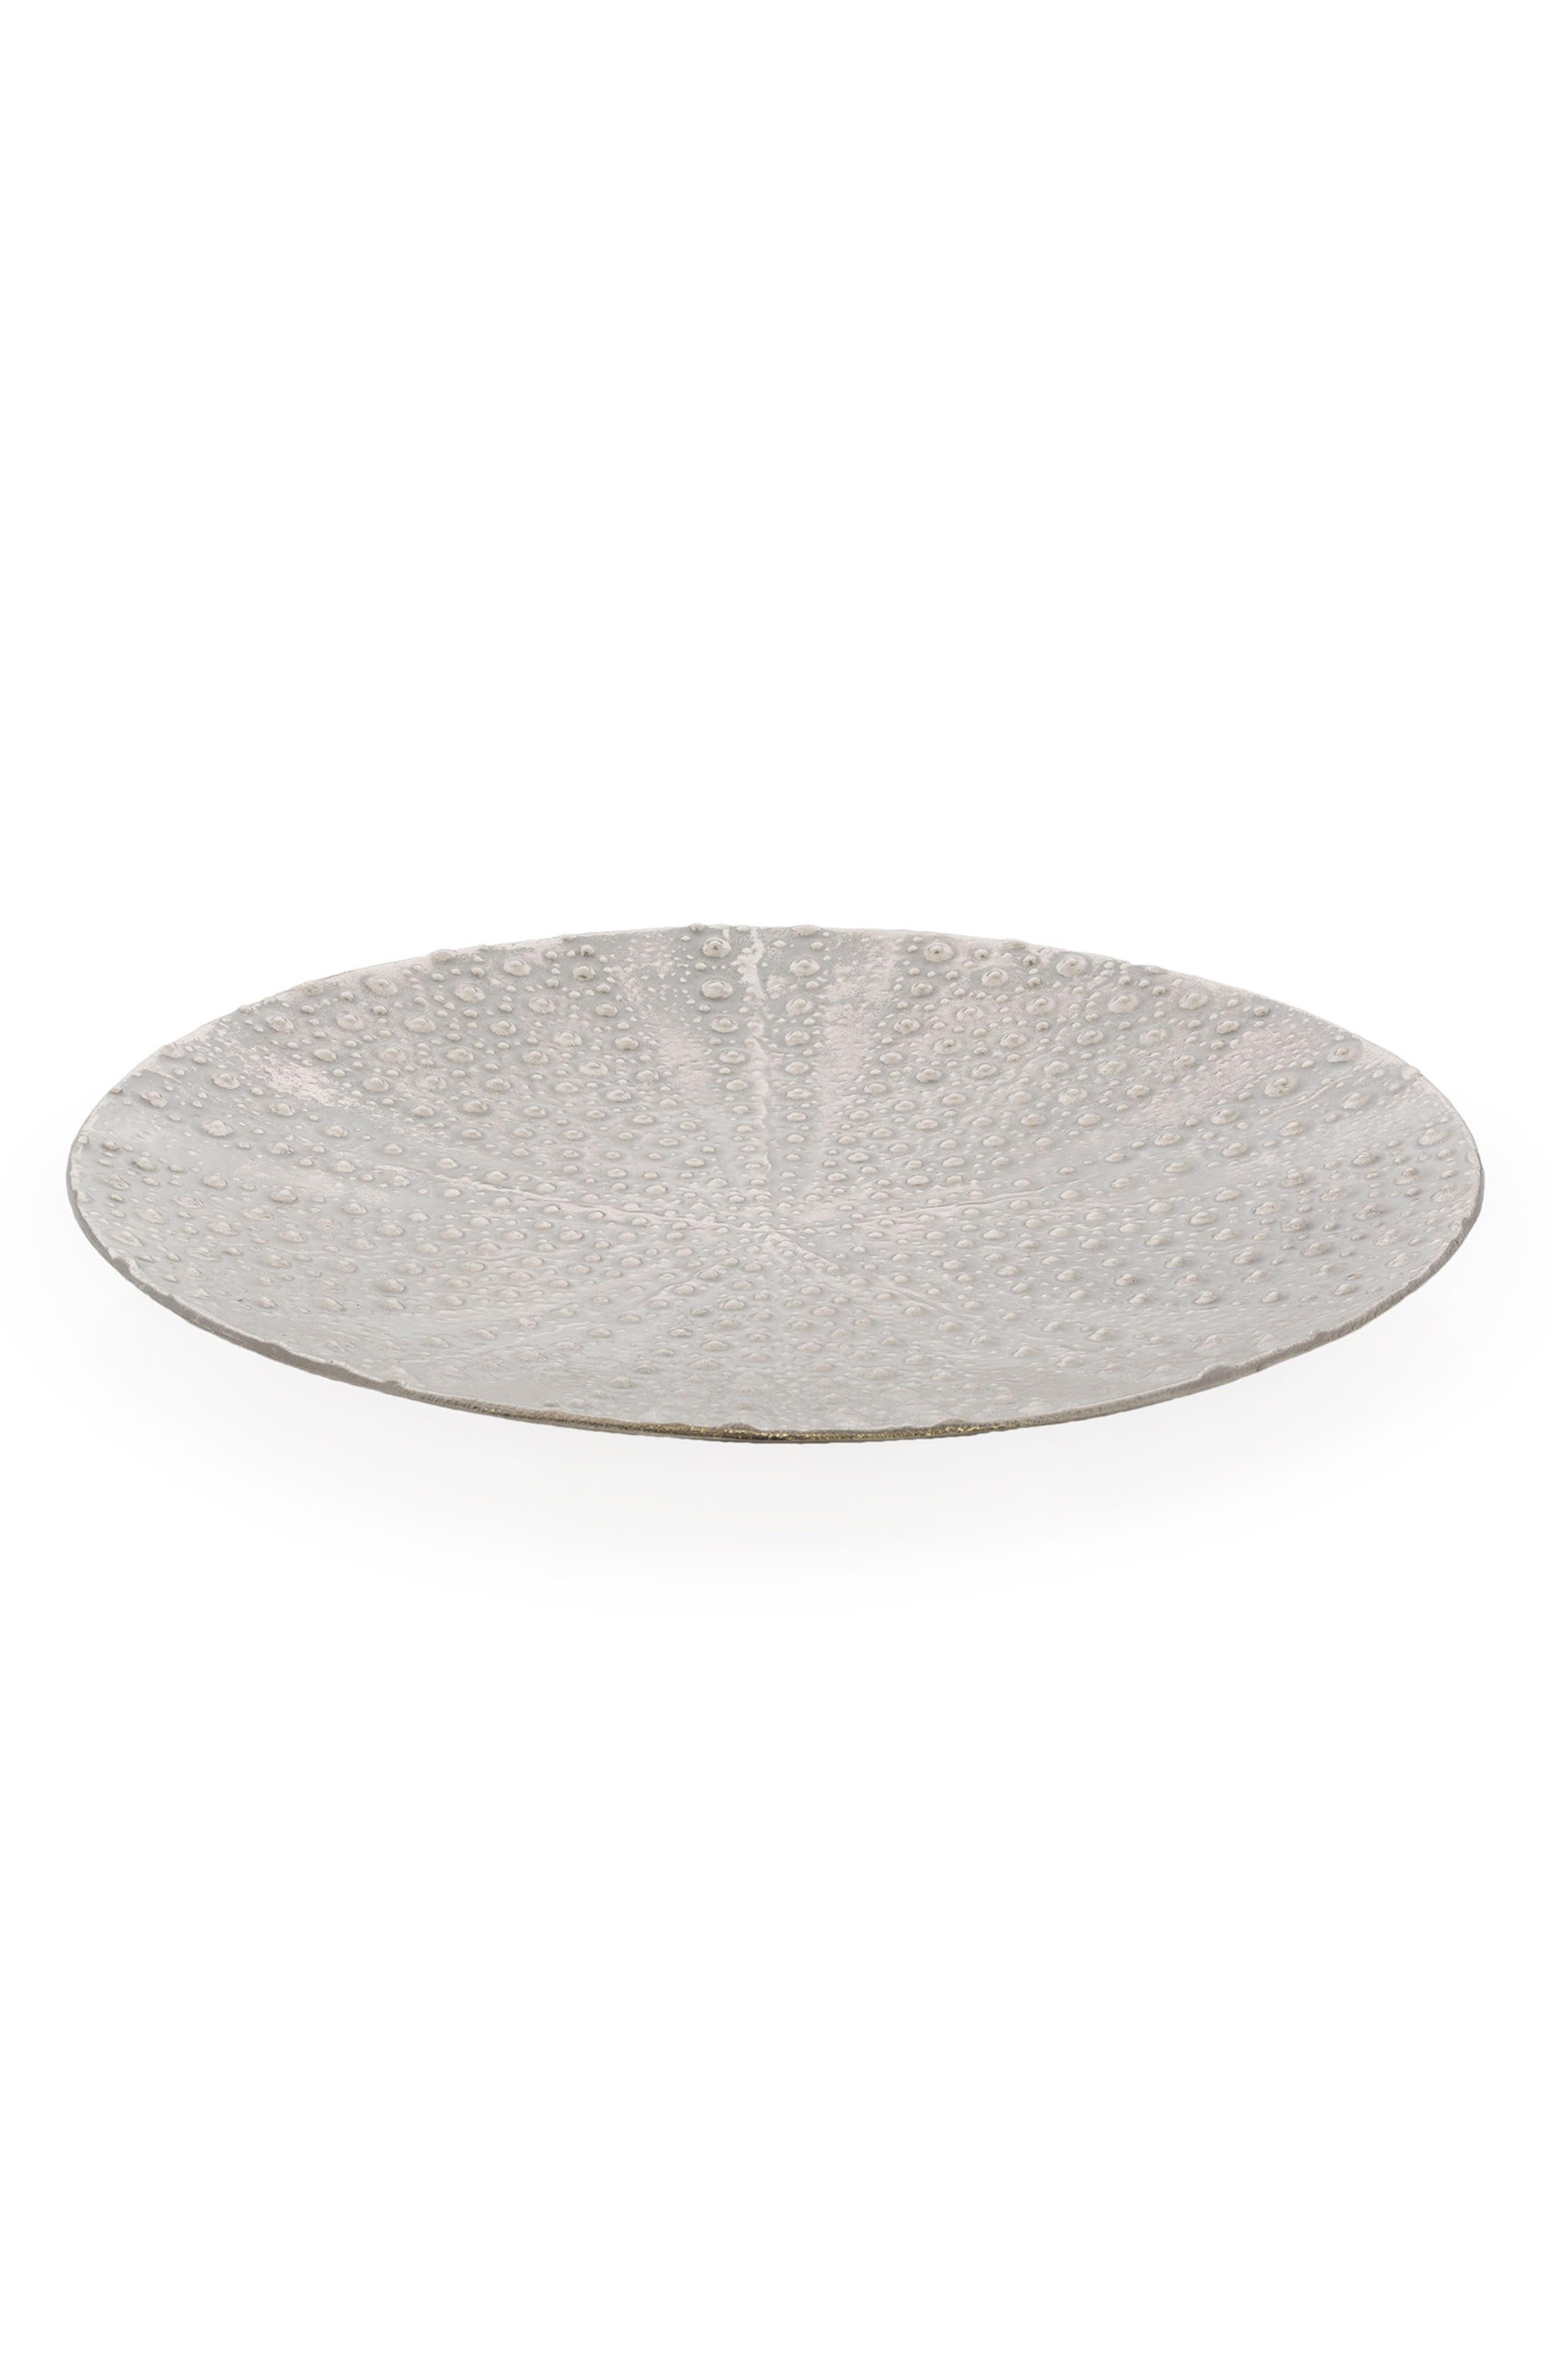 Ocean Reef Sea Urchin Platter,                         Main,                         color, Silver